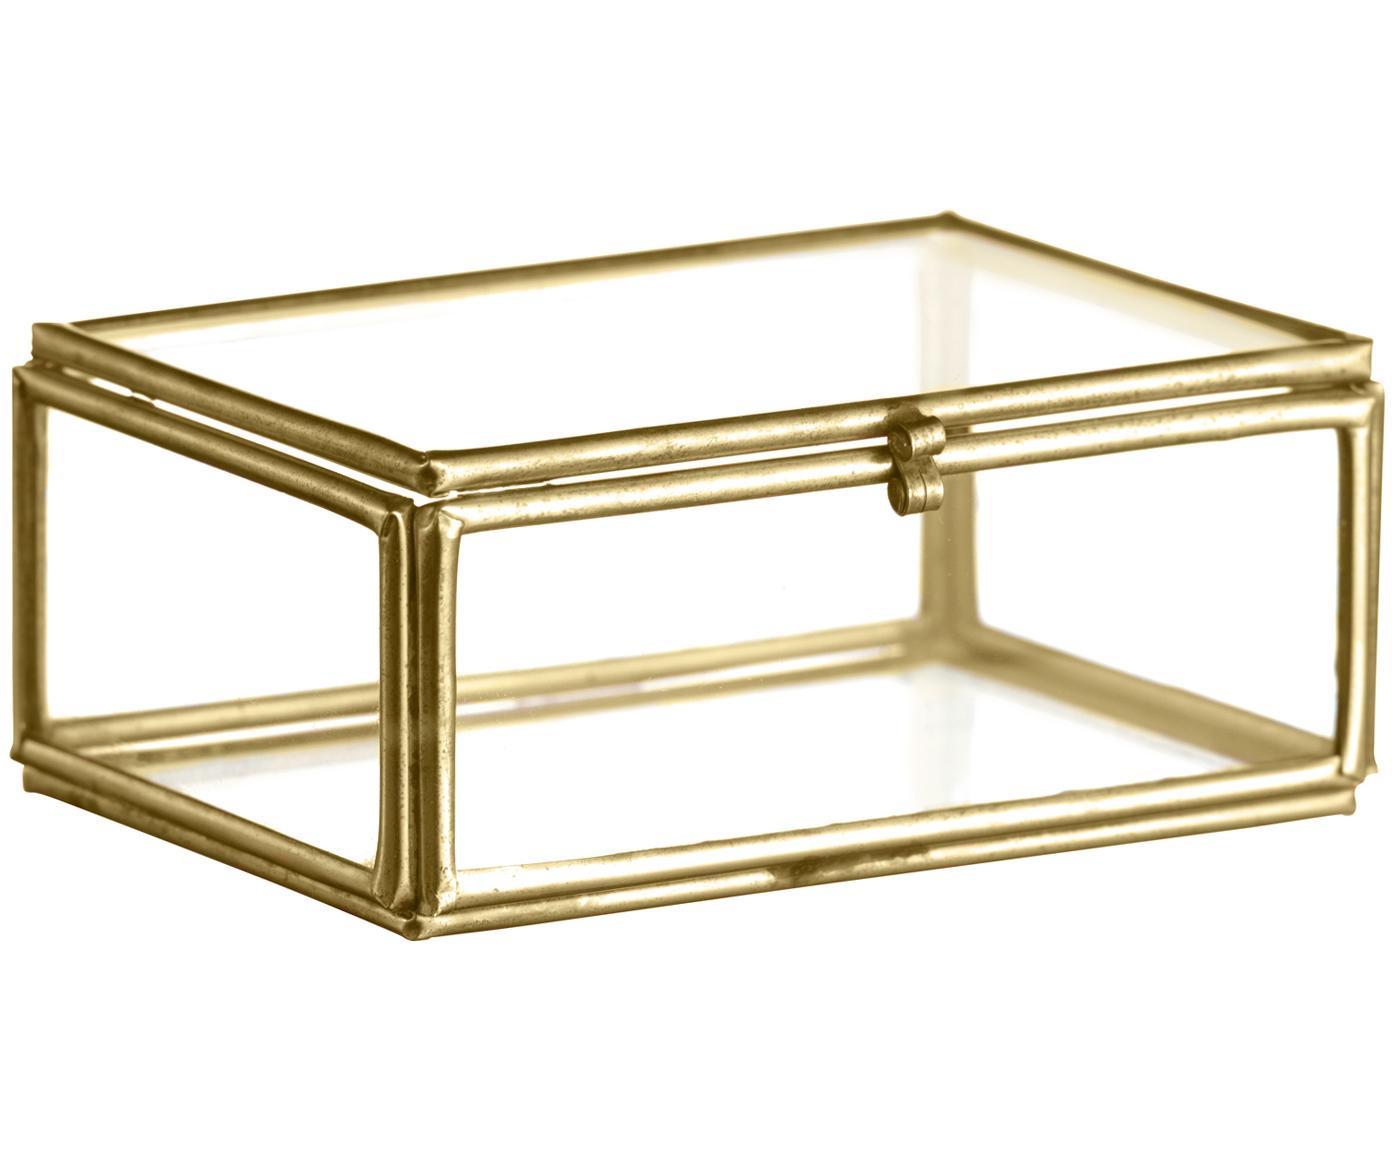 Portagioie Ivey, Struttura: metallo rivestito, Ottonato, Larg. 9 x Alt. 4 cm